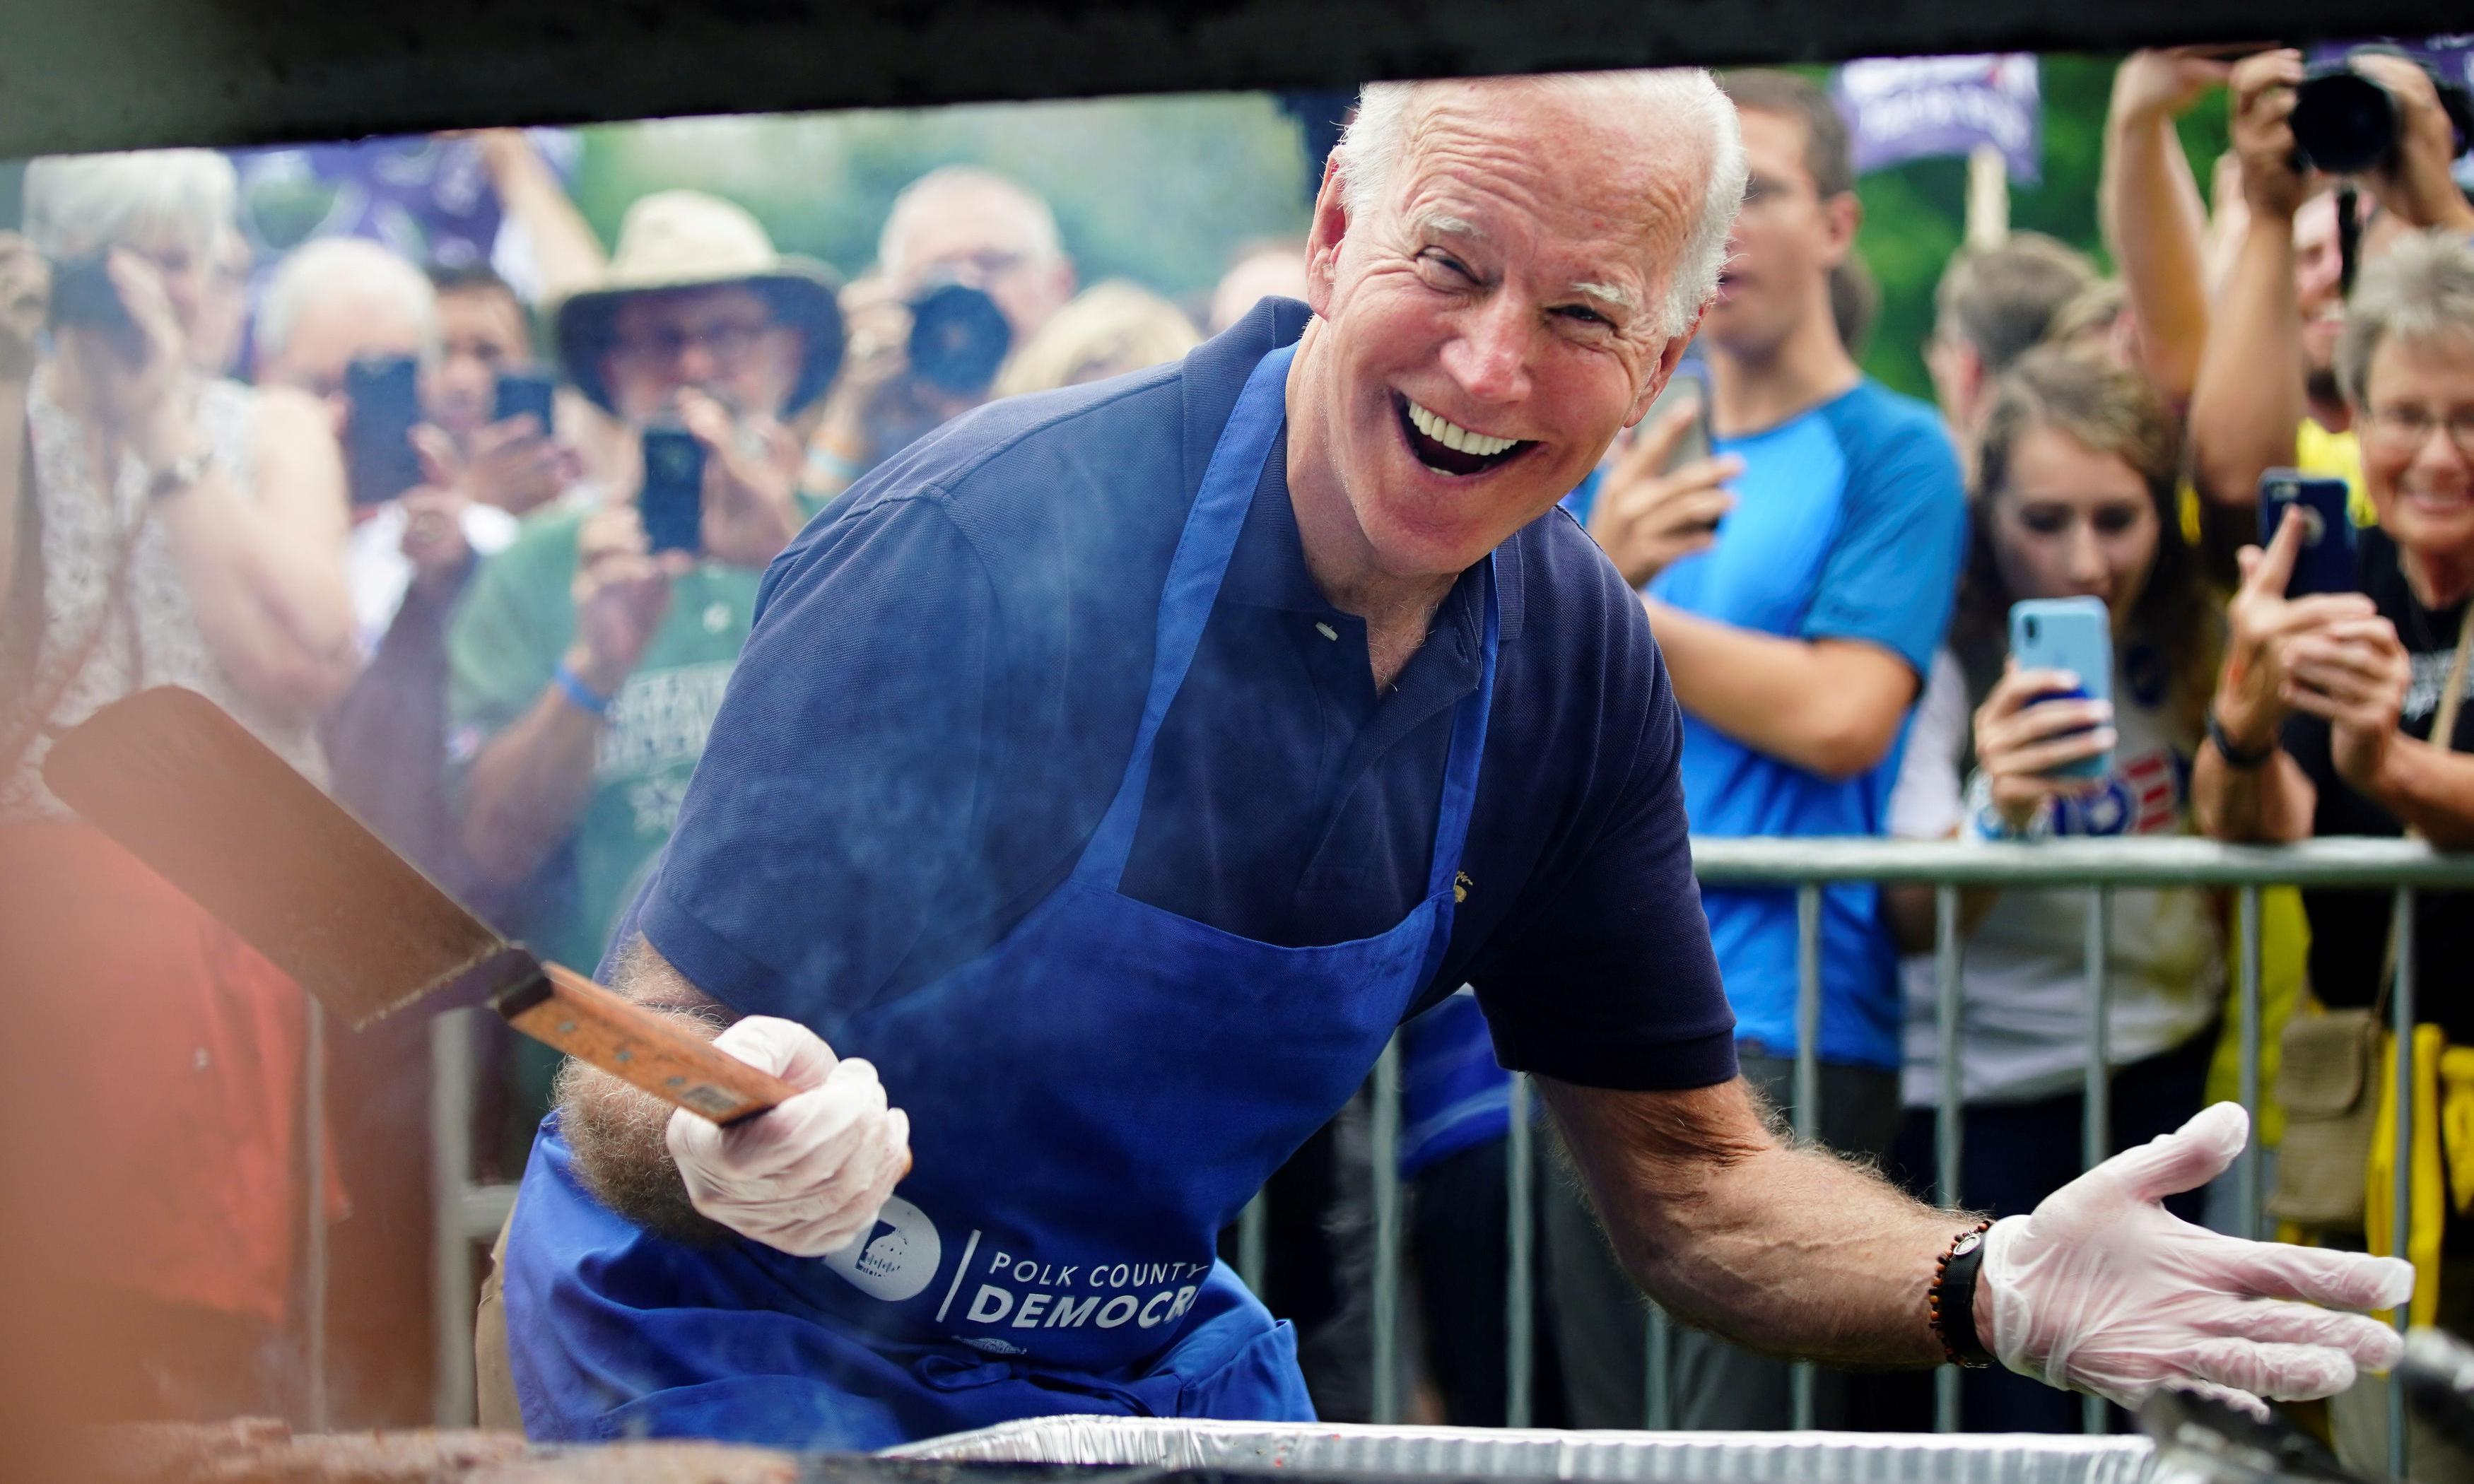 Trump goes on offensive over Biden and Ukraine as Schiff ponders impeachment